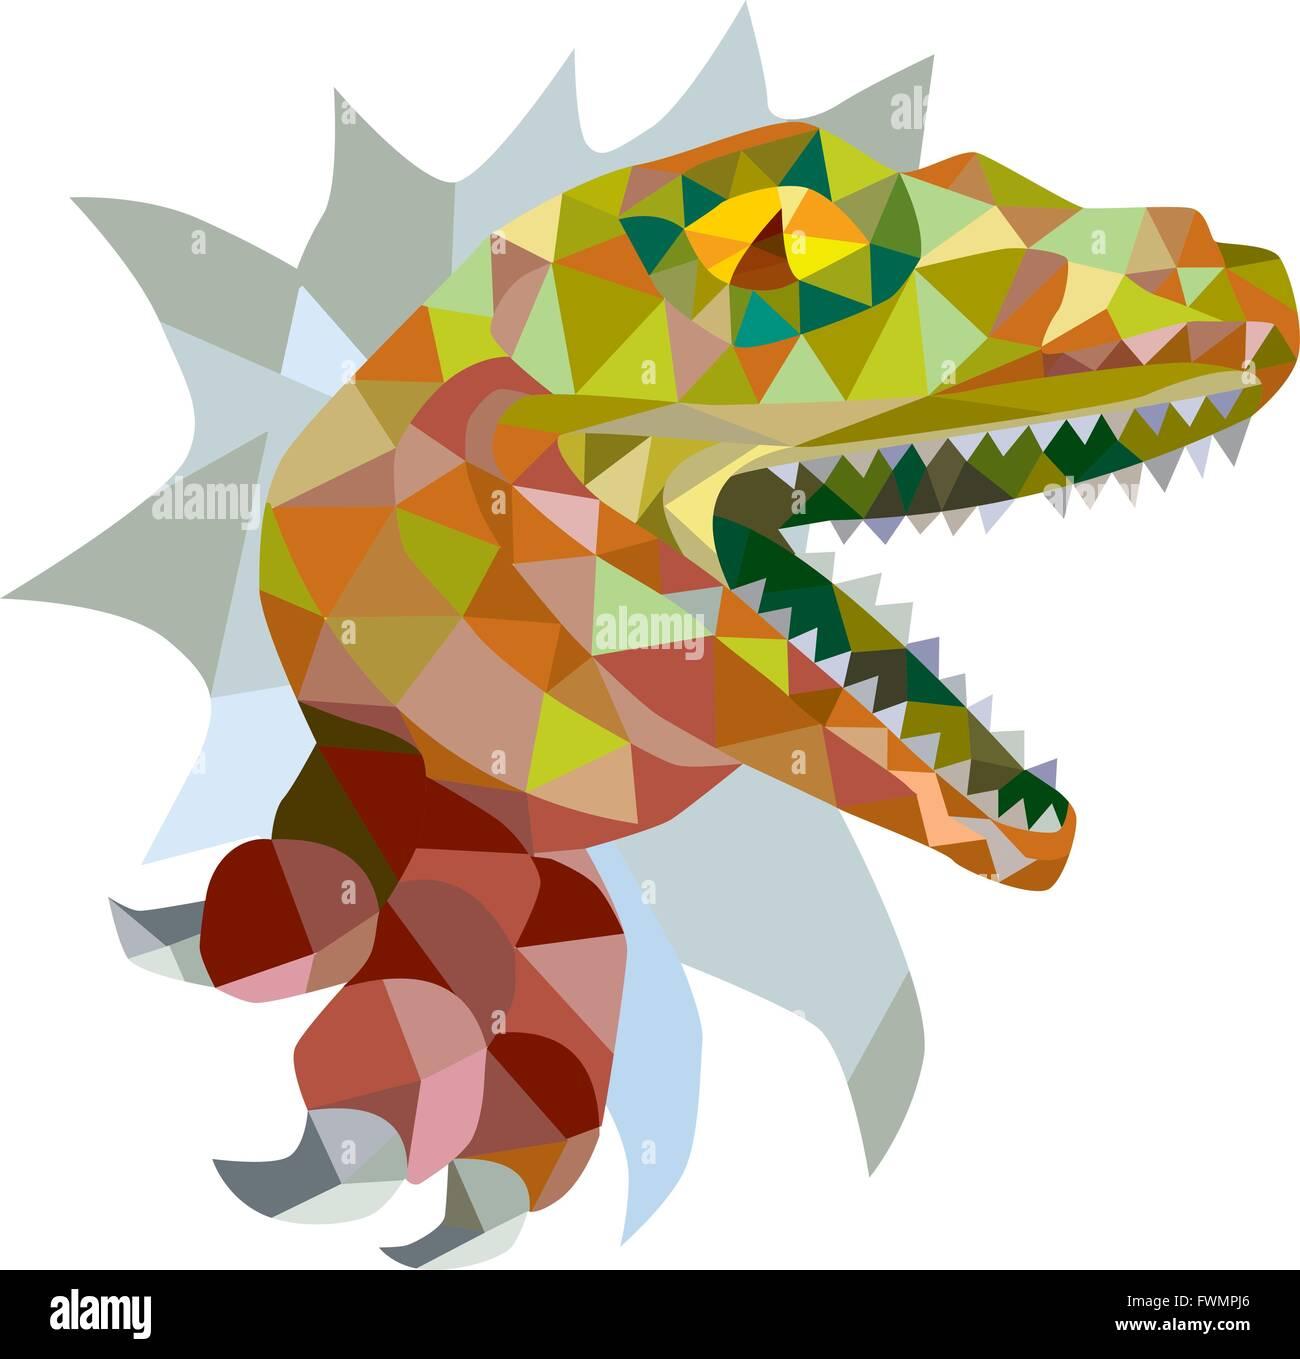 Wallpaper : chris, paper, square, origami, lizard, heynen ... | 1359x1300